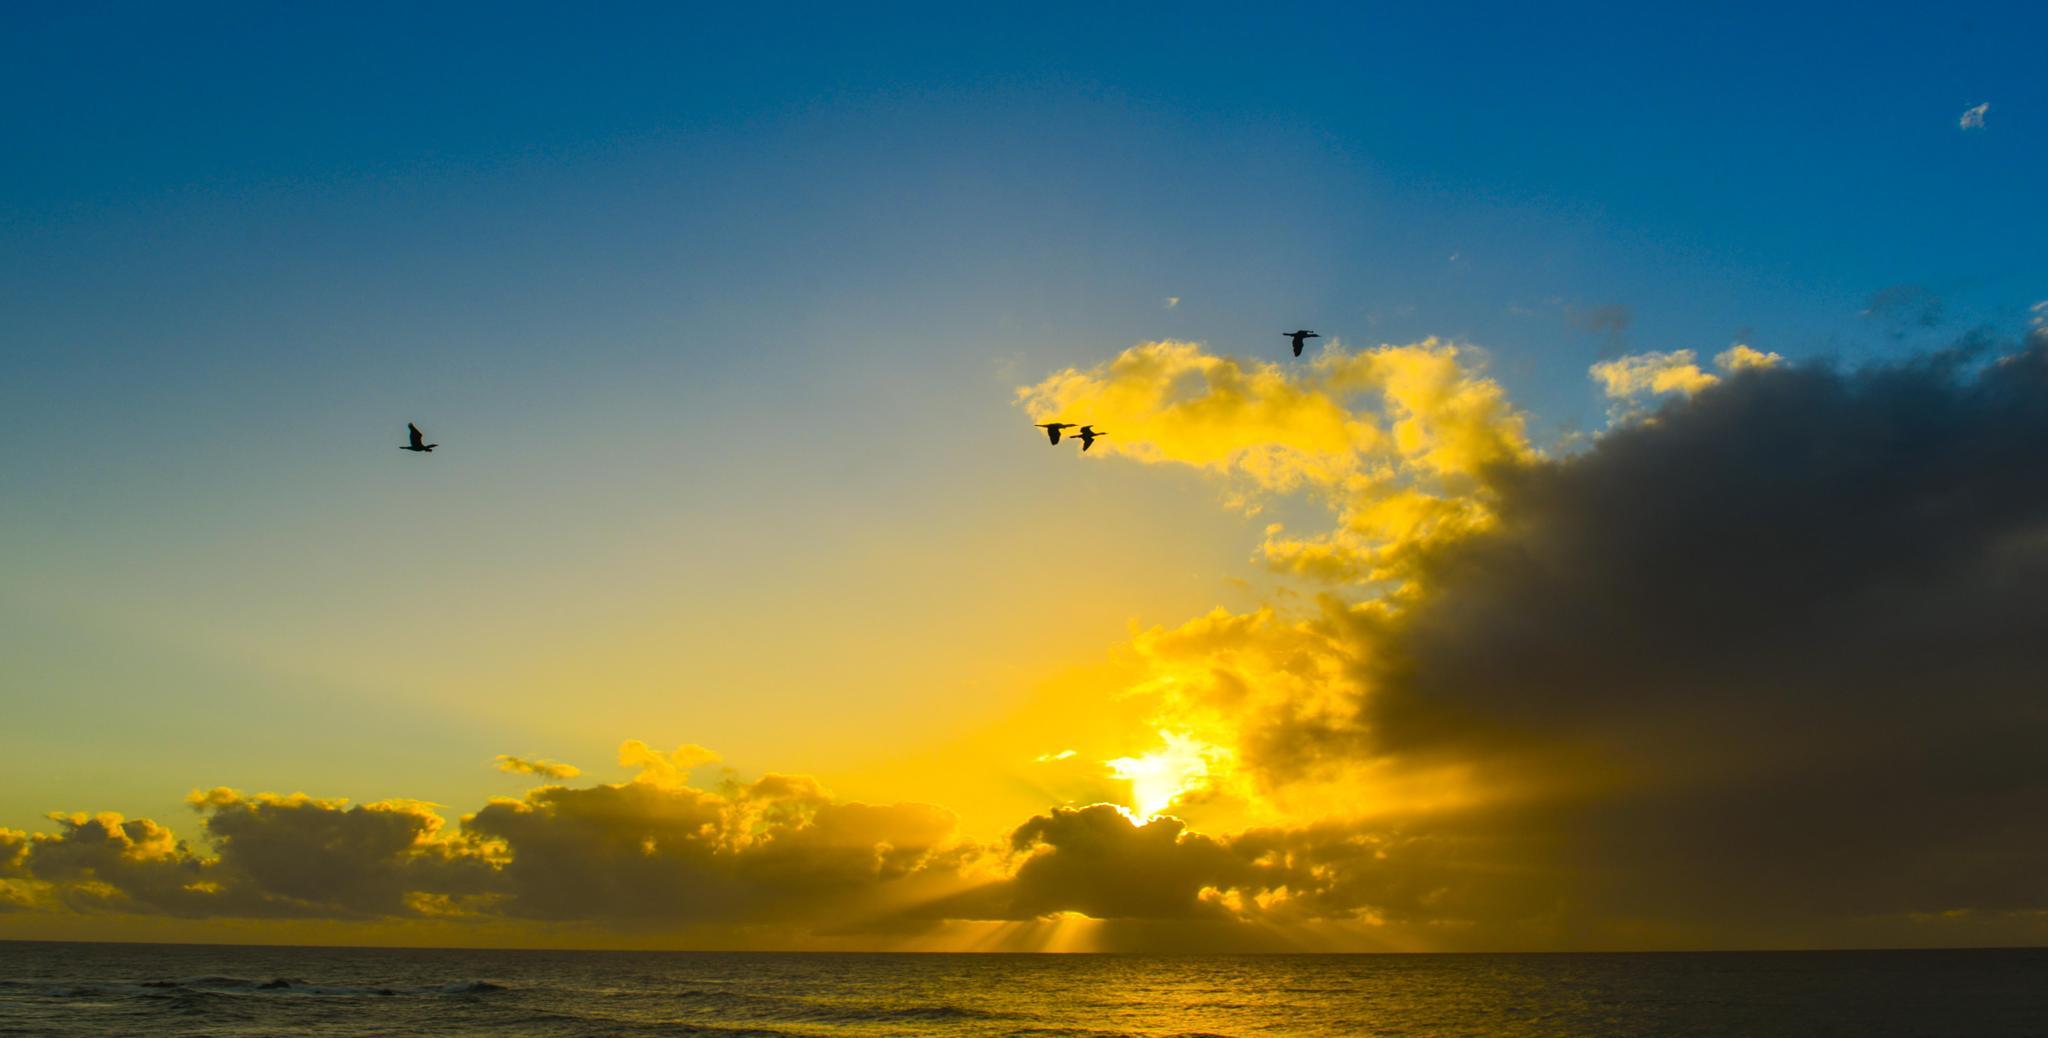 Sunrise by chrisgnixon